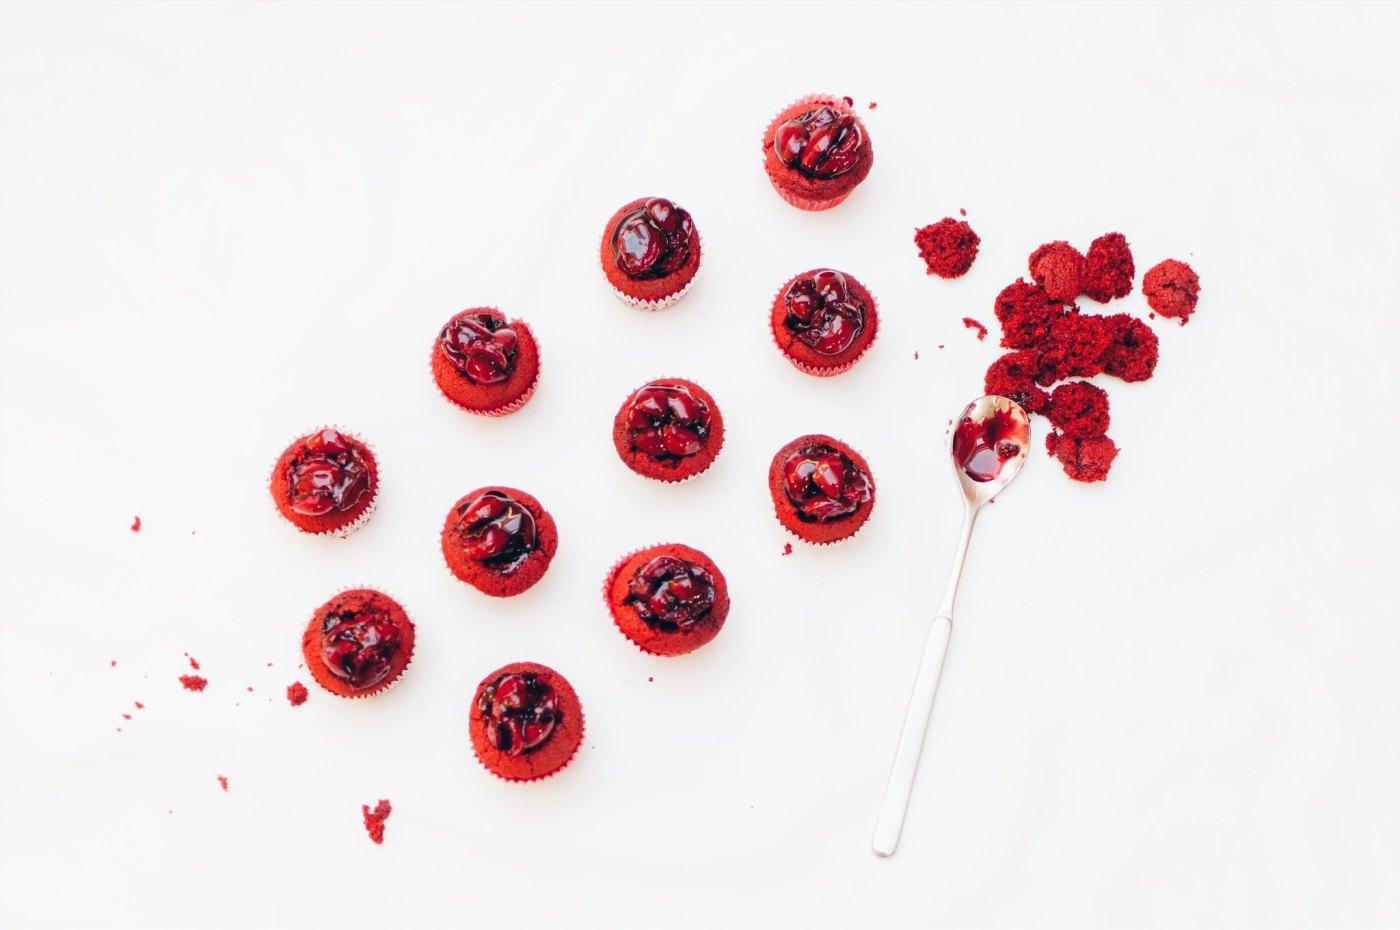 red velvet cherry bombs with cream cheese frosting and maraschino cherries